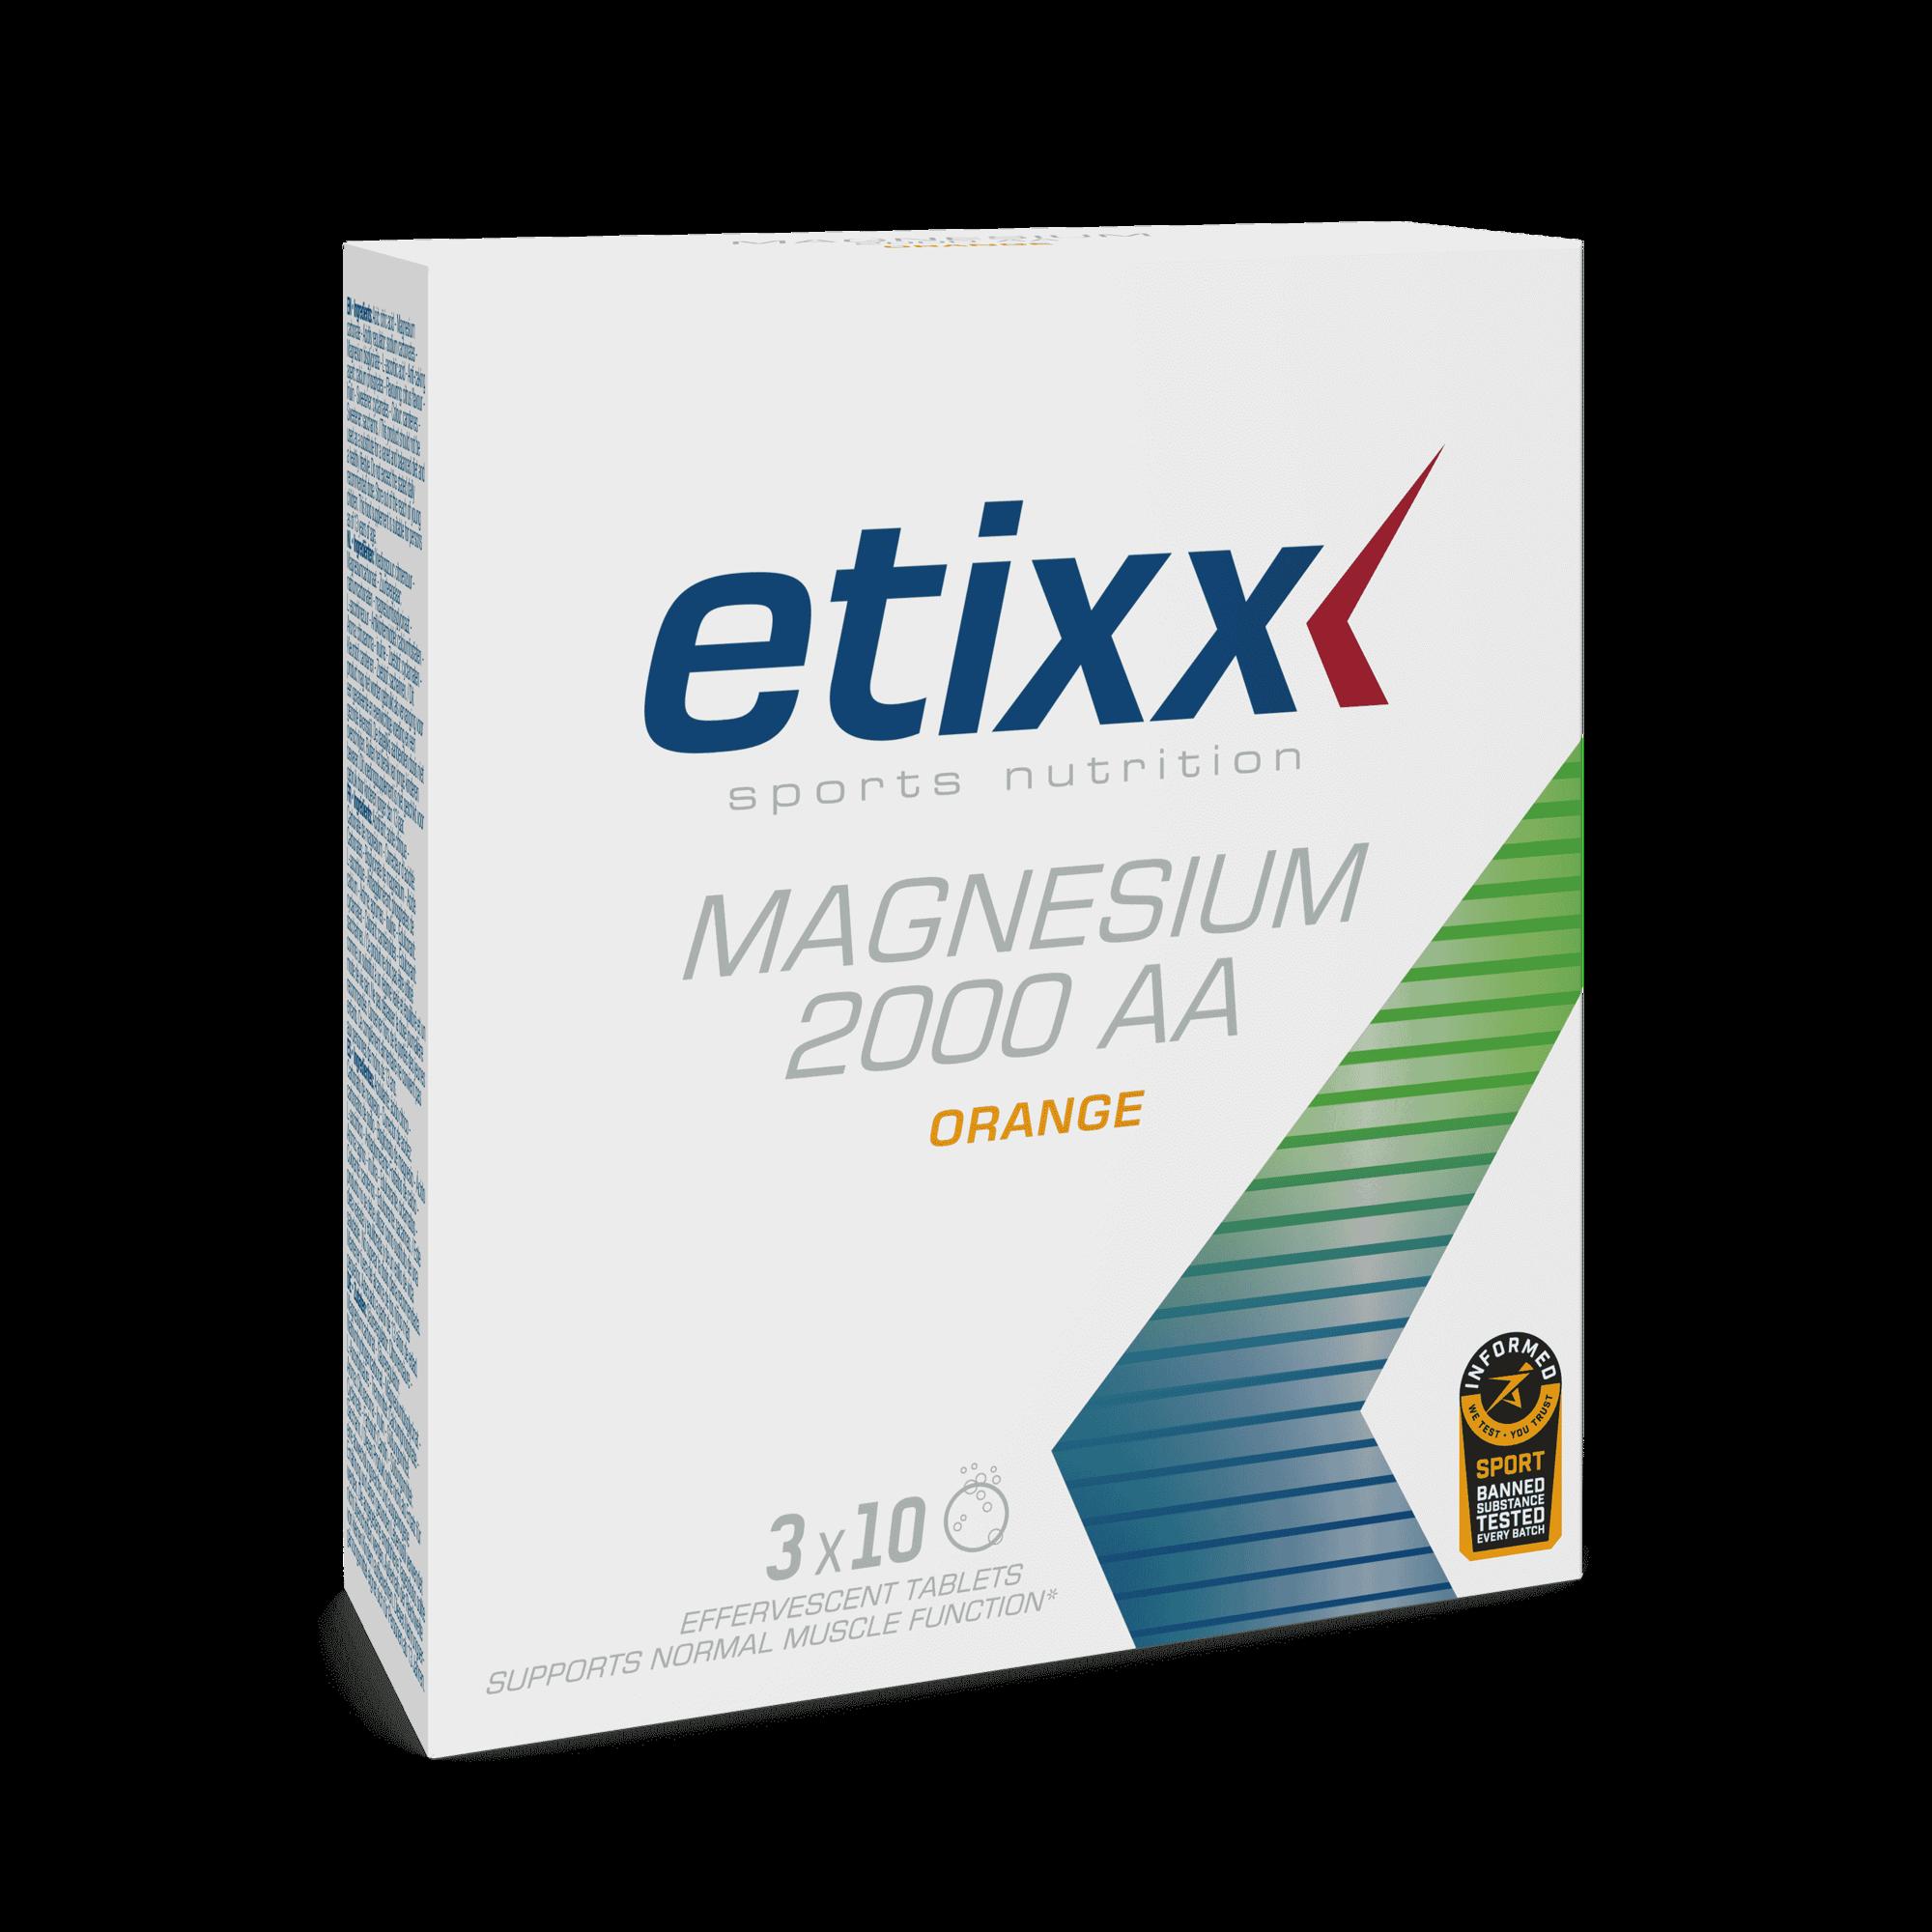 Magnesium 2000 AA